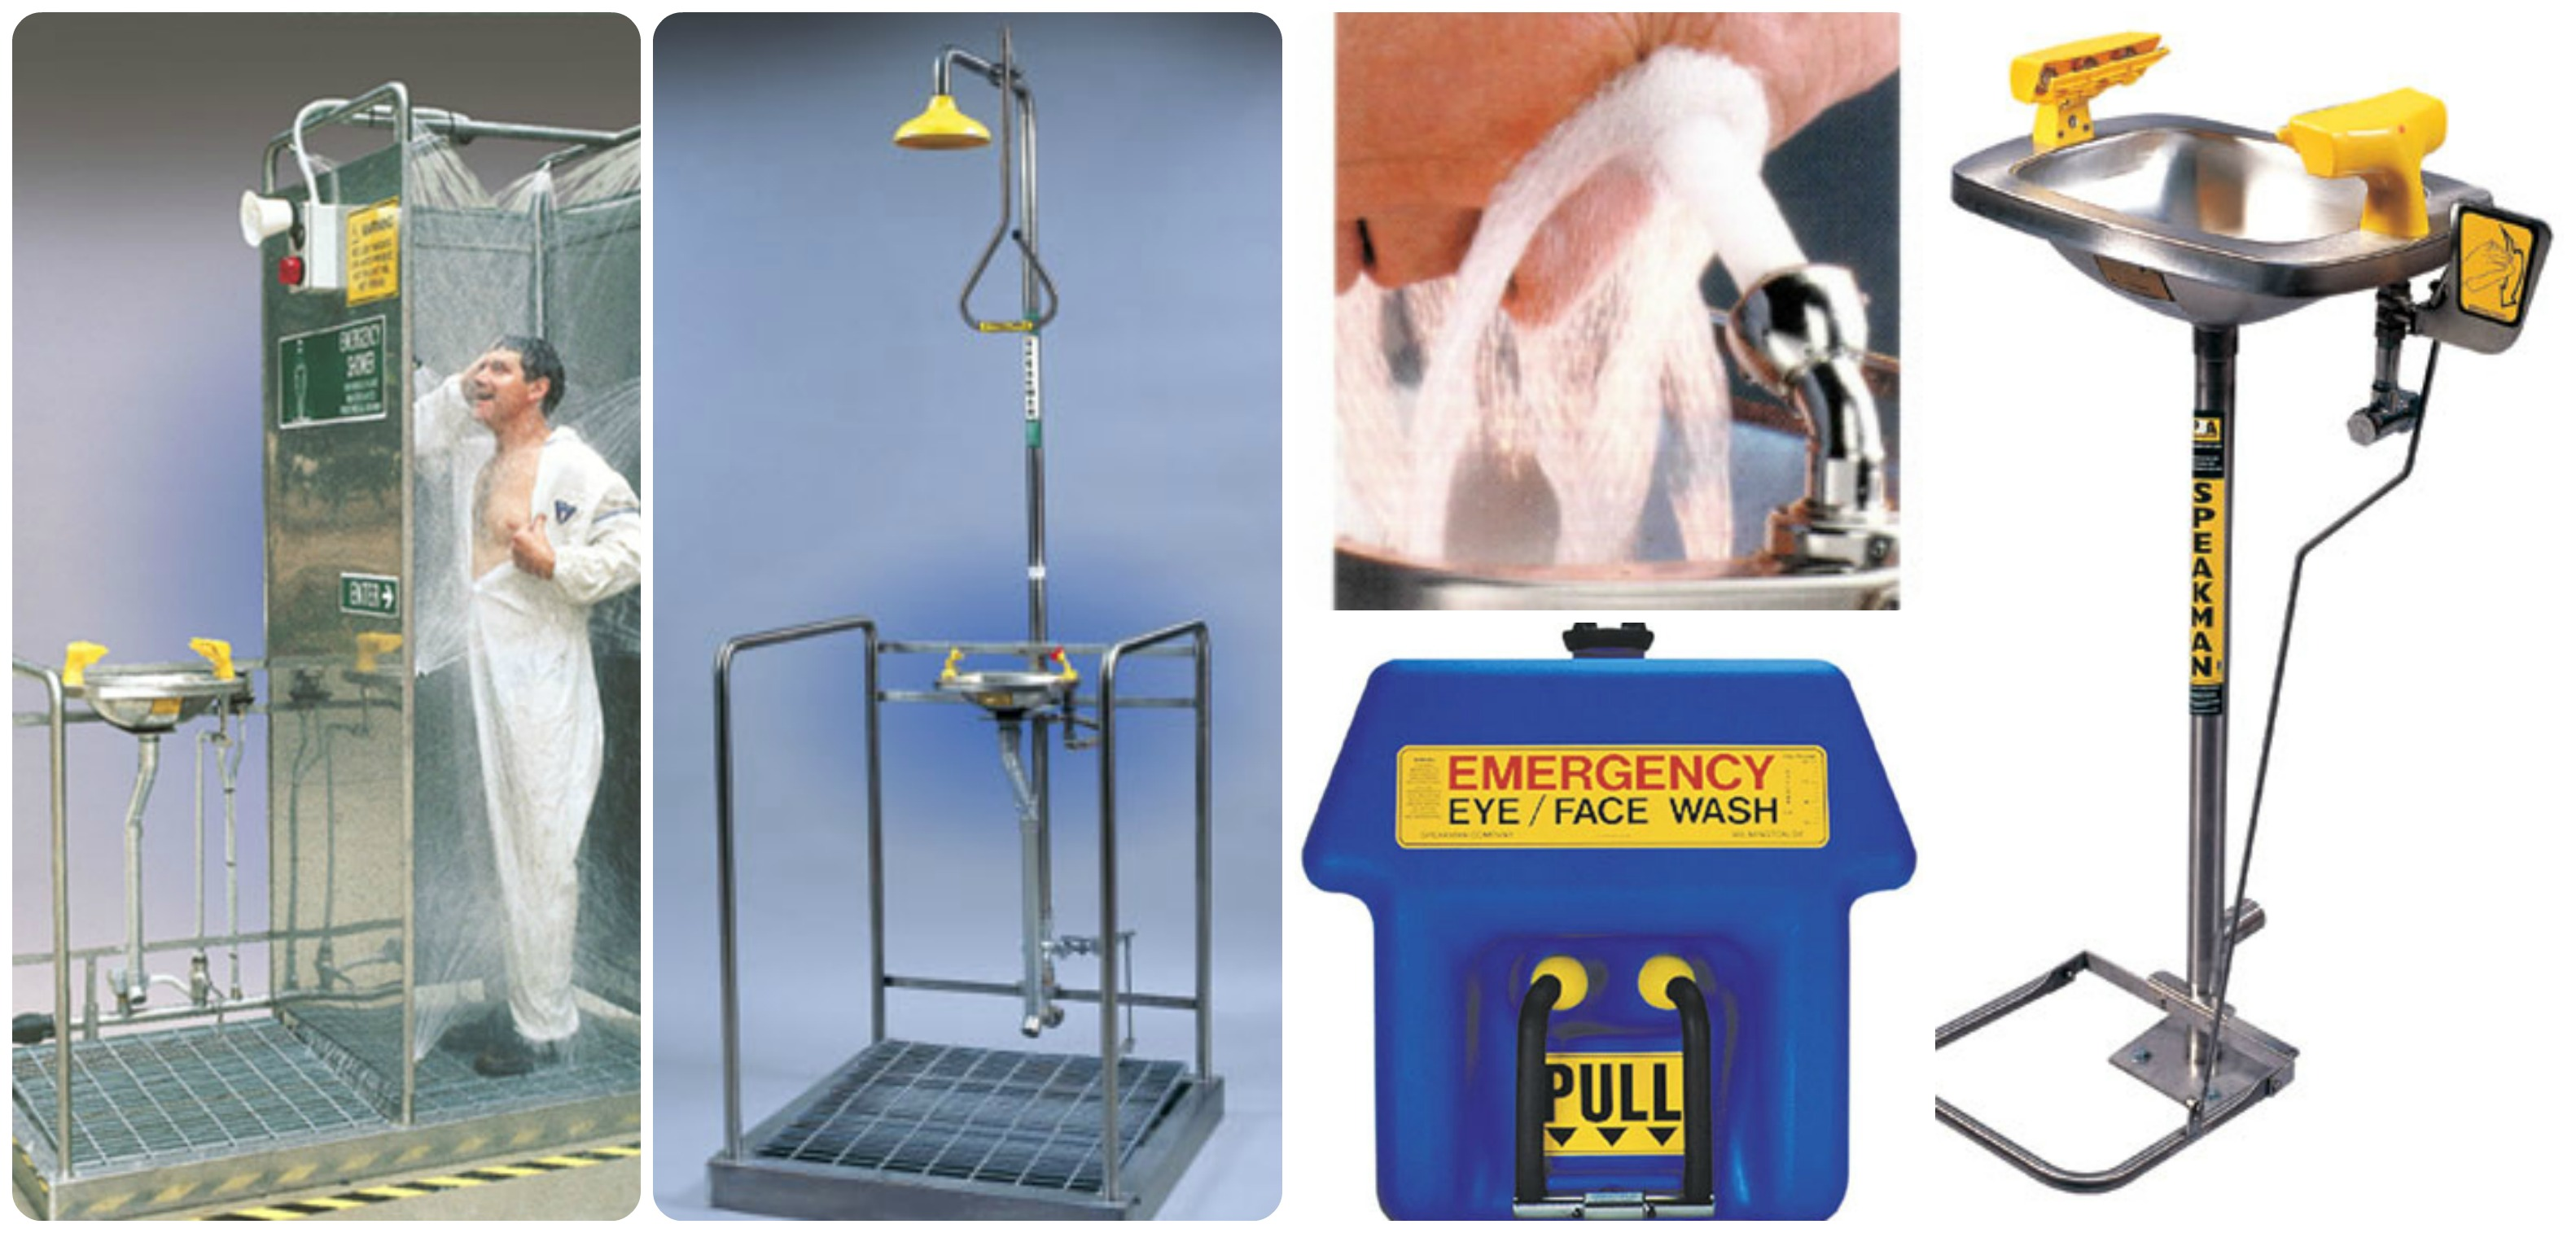 Showers & Eyewash Stations